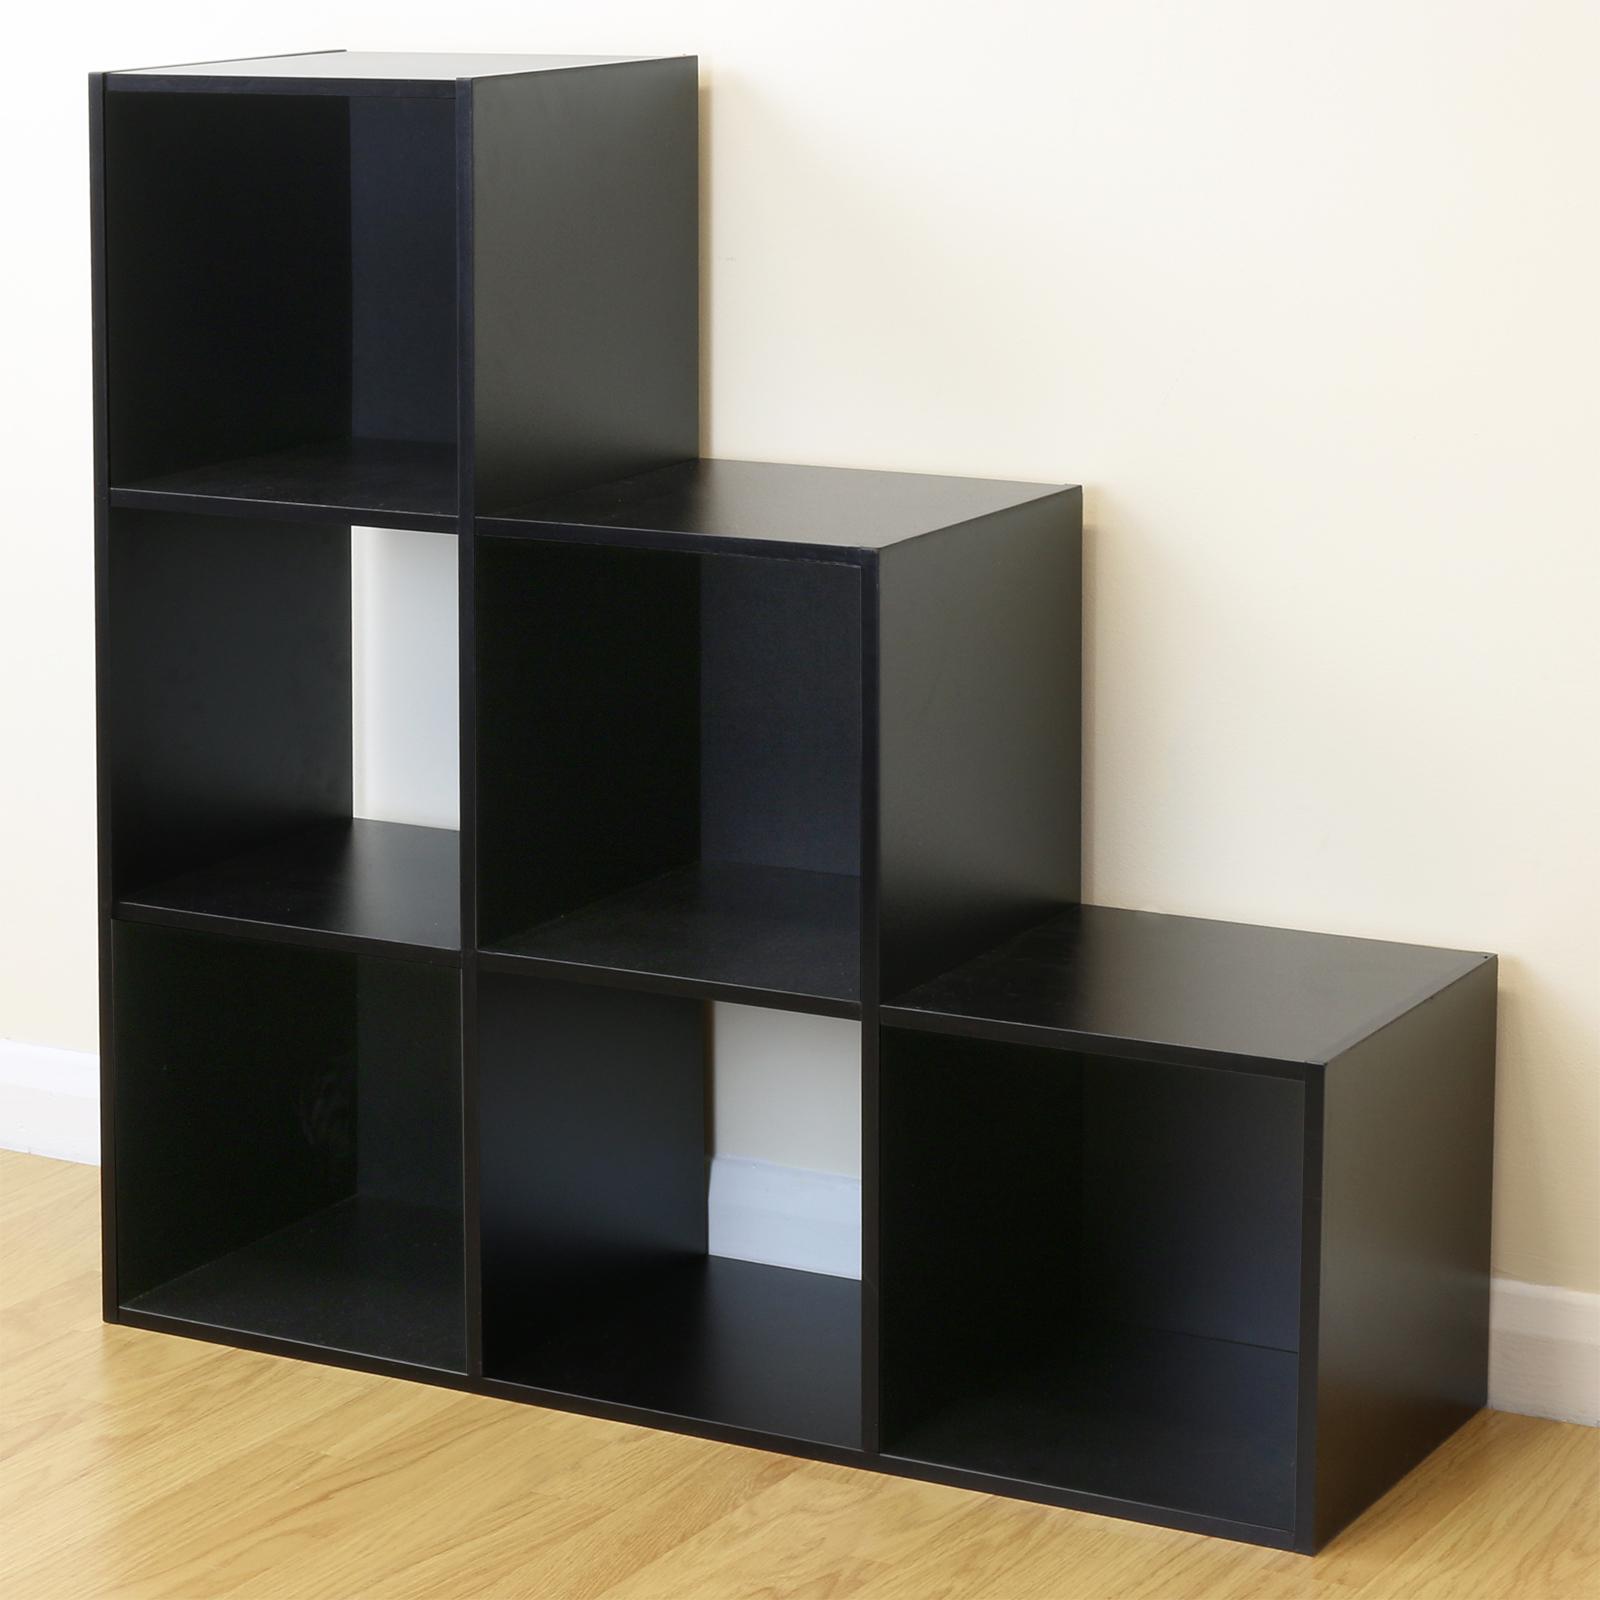 White 6 Cube Kids Toy Games Storage Unit Girls Boys: Black 6 Cube Kids Toy/Games Storage Unit Girls/Boys